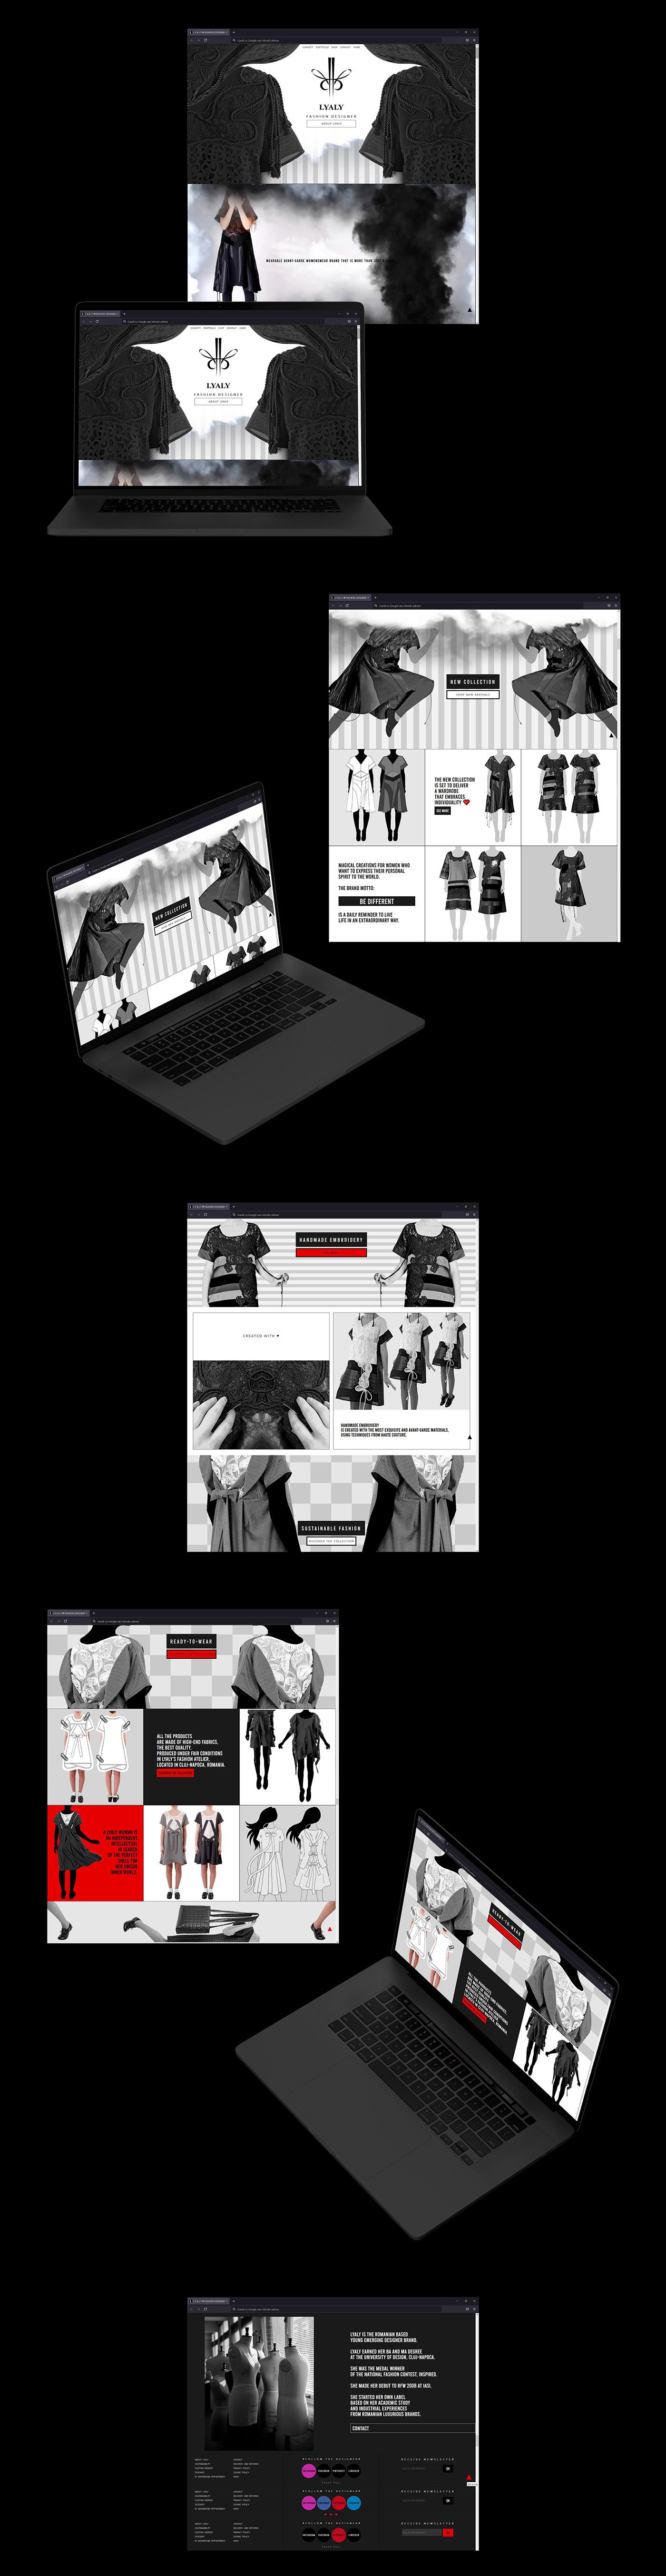 banner design css front-end graphic design  HTML interactive design ui design UX design Web Design  web development